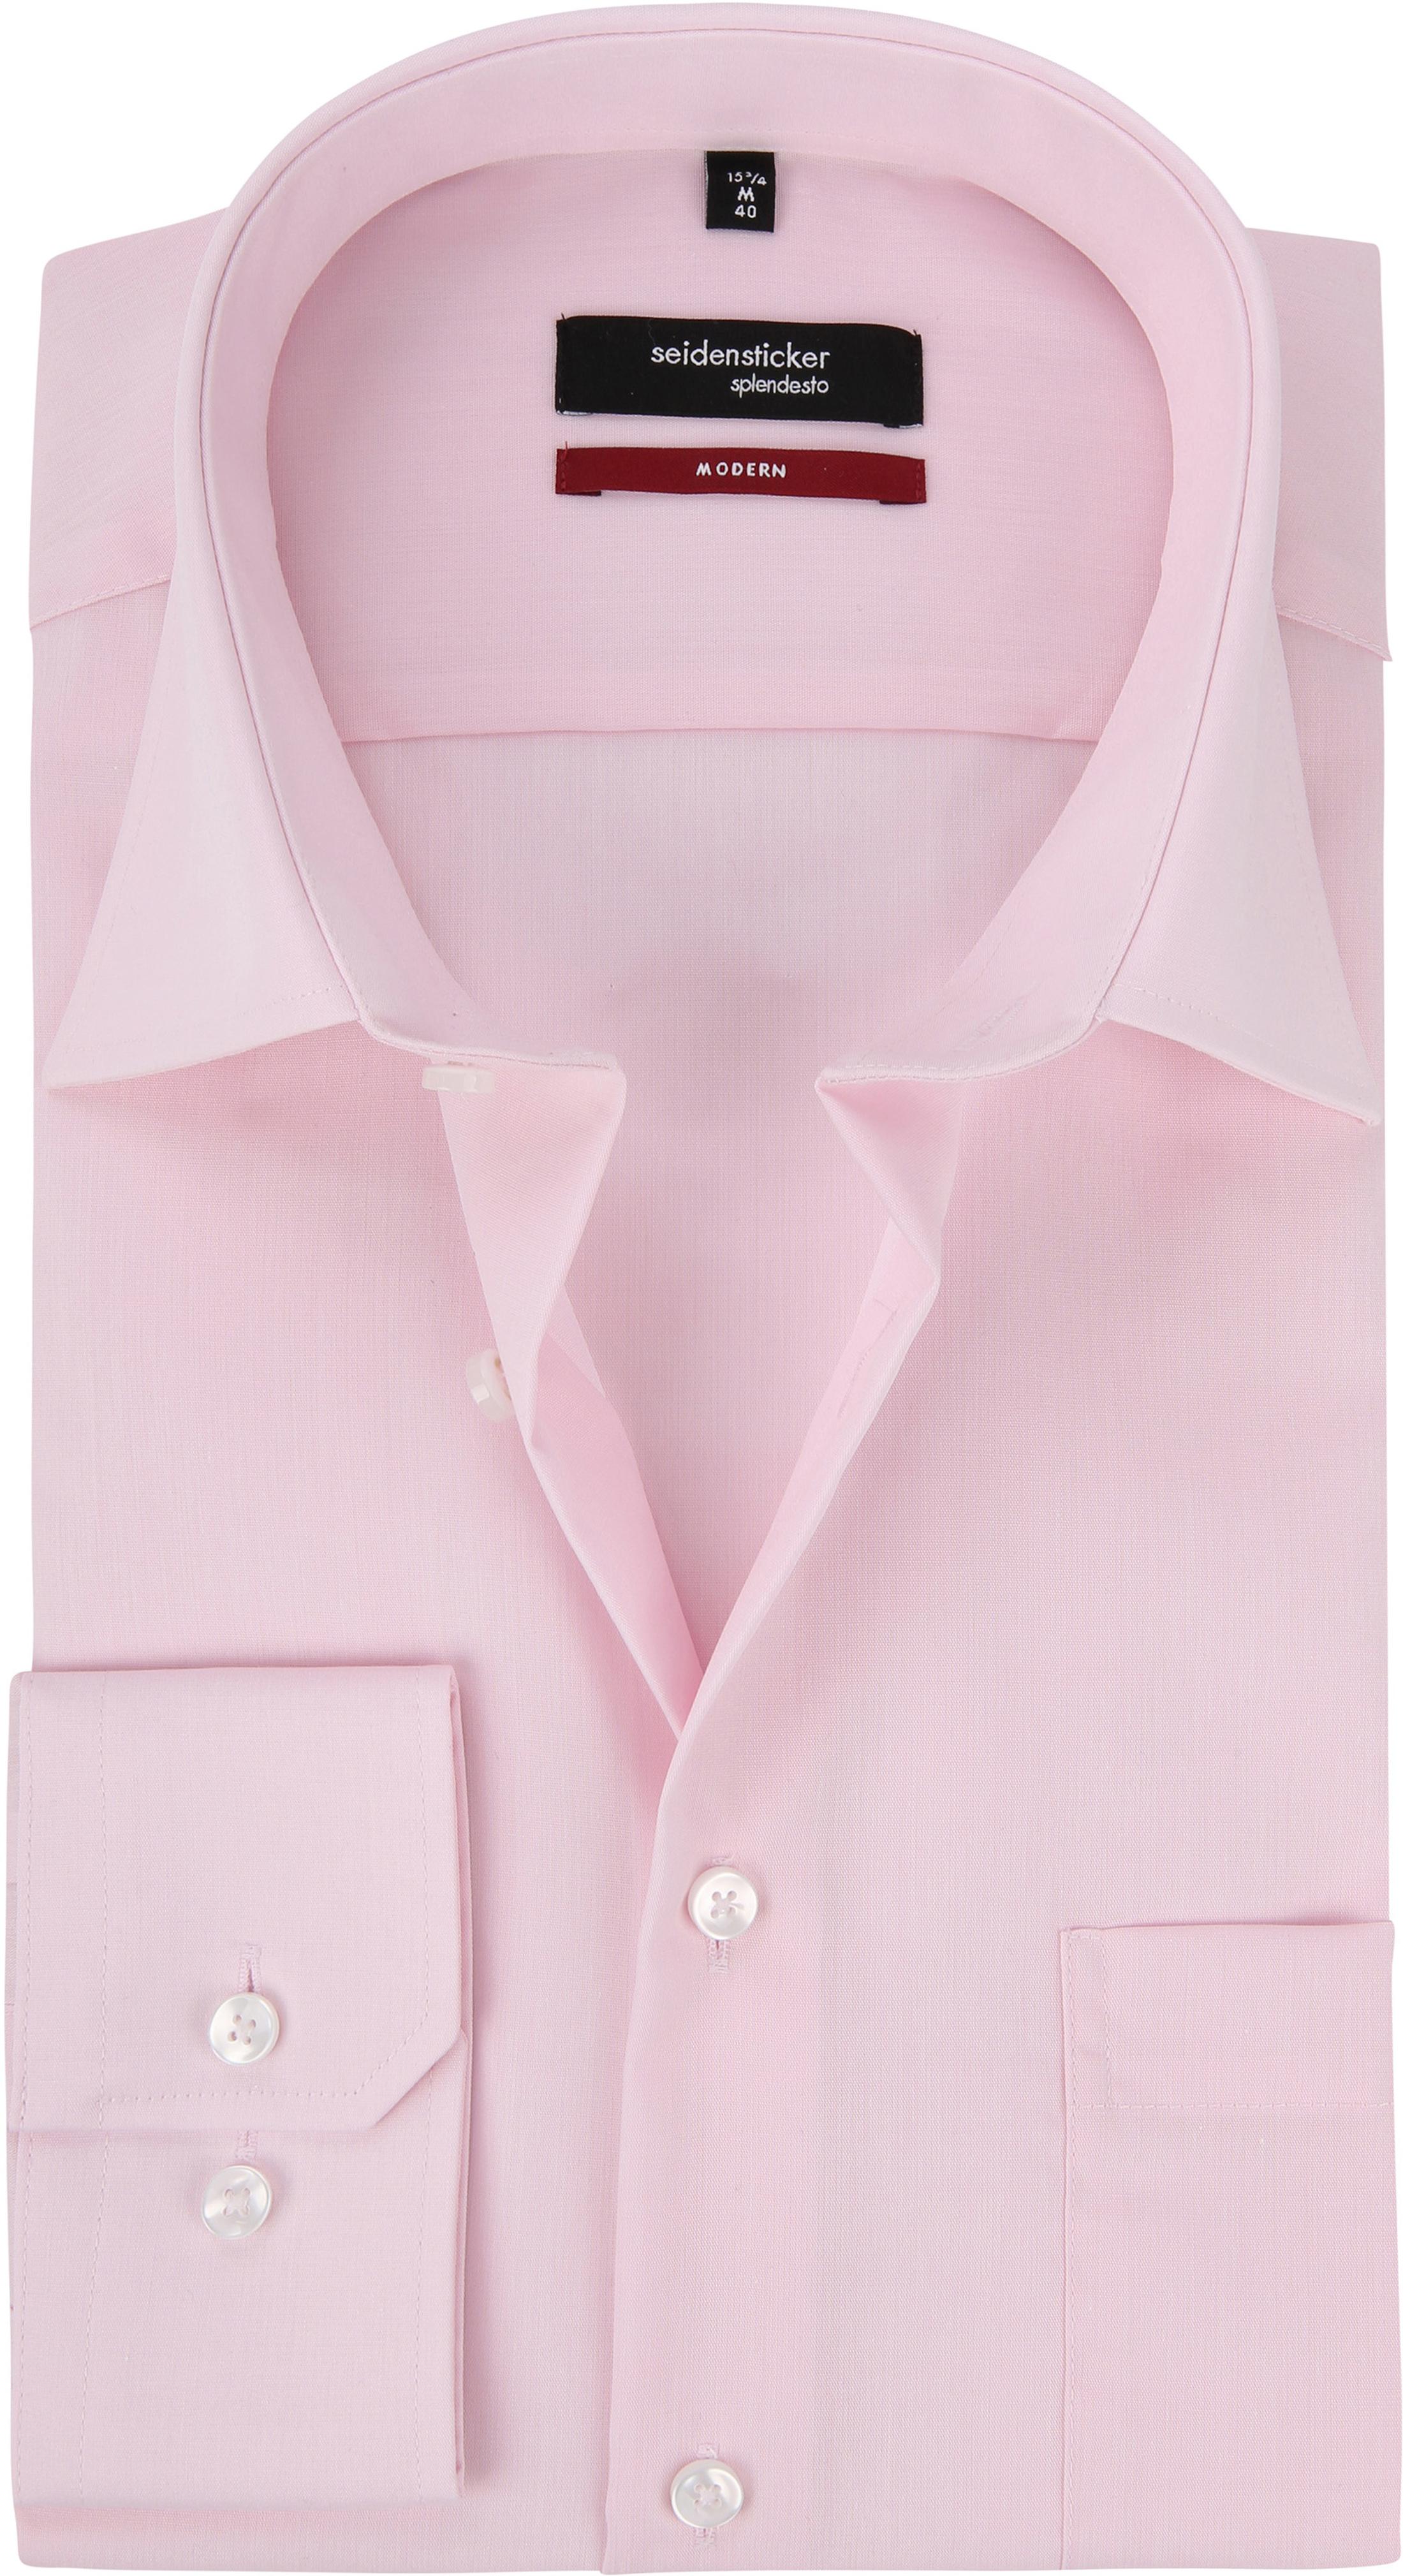 Seidensticker Hemd Modern Bügelfrei  Rosa foto 0